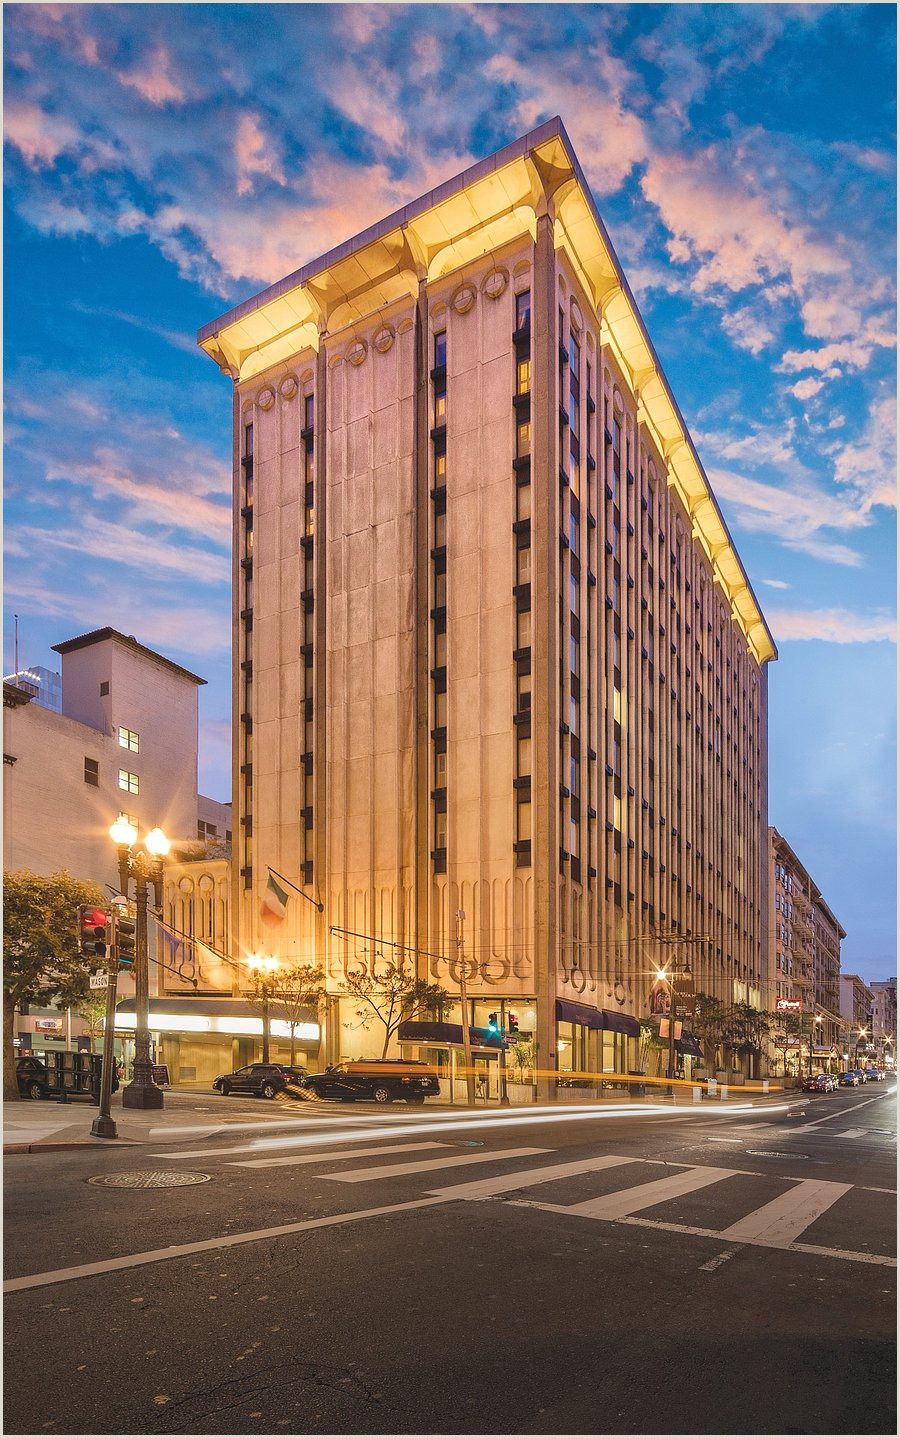 Best Business Cards Sf Ca The Donatello $110 $̶1̶5̶6̶ Updated 2020 Prices & Hotel